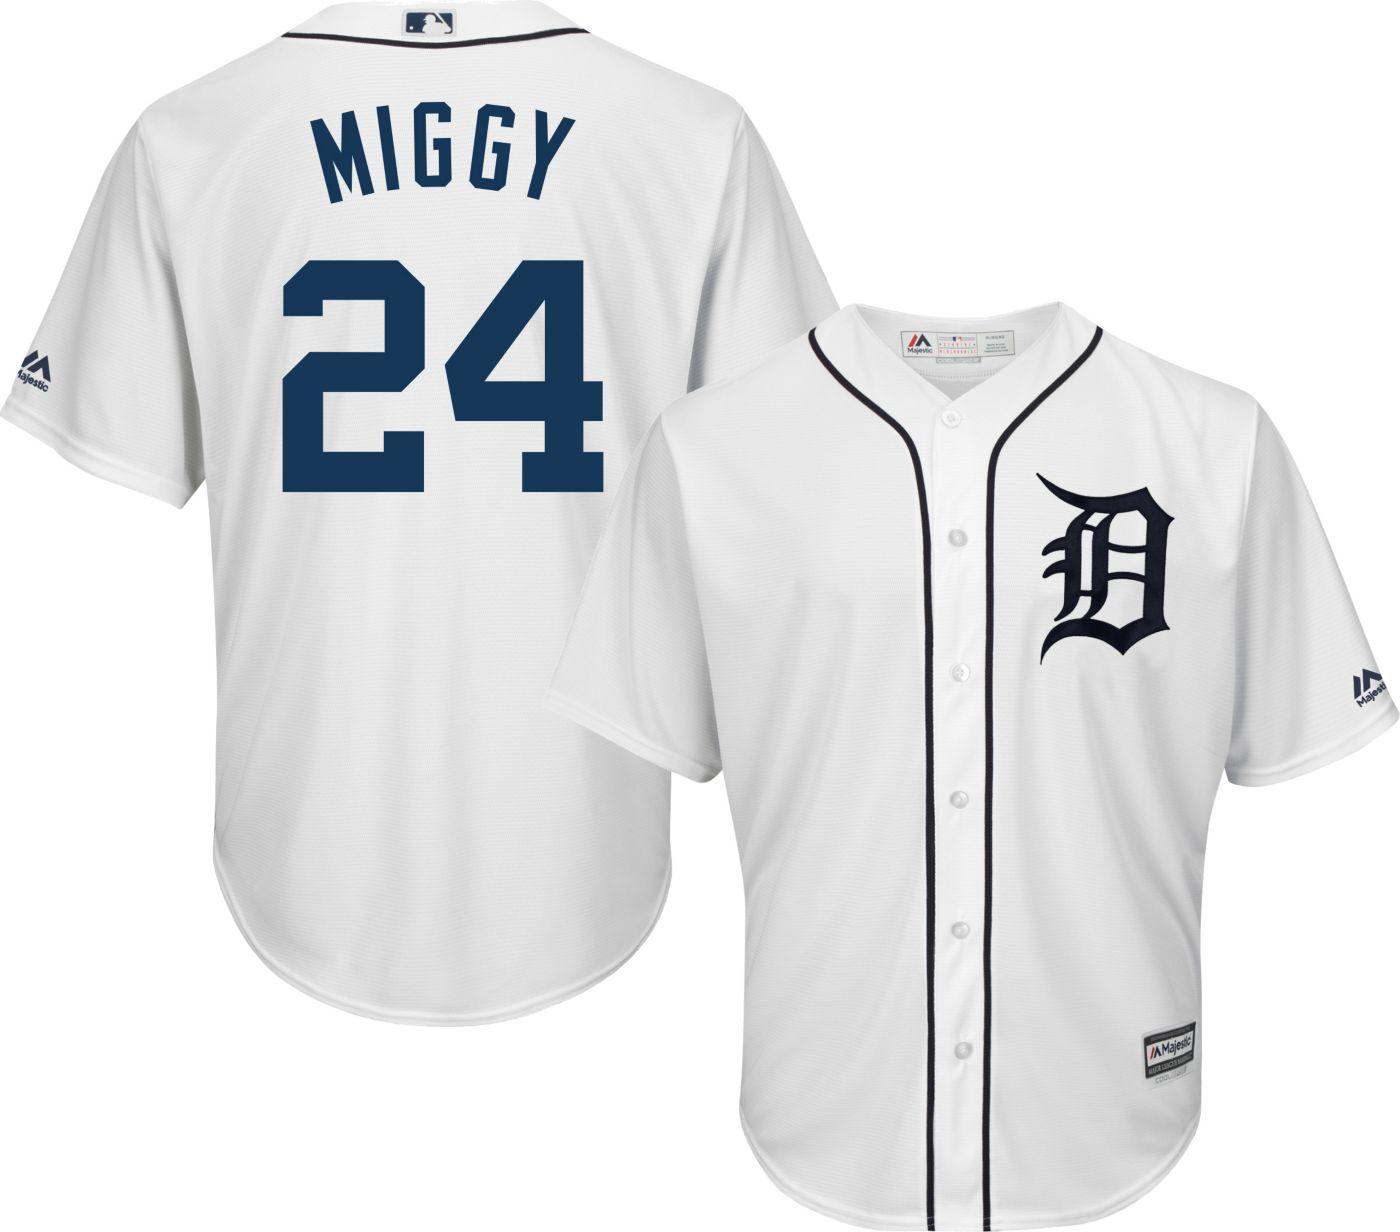 Majestic Men's Replica Detroit Tigers Miguel Cabrera #24 Cool Base Home White Jersey